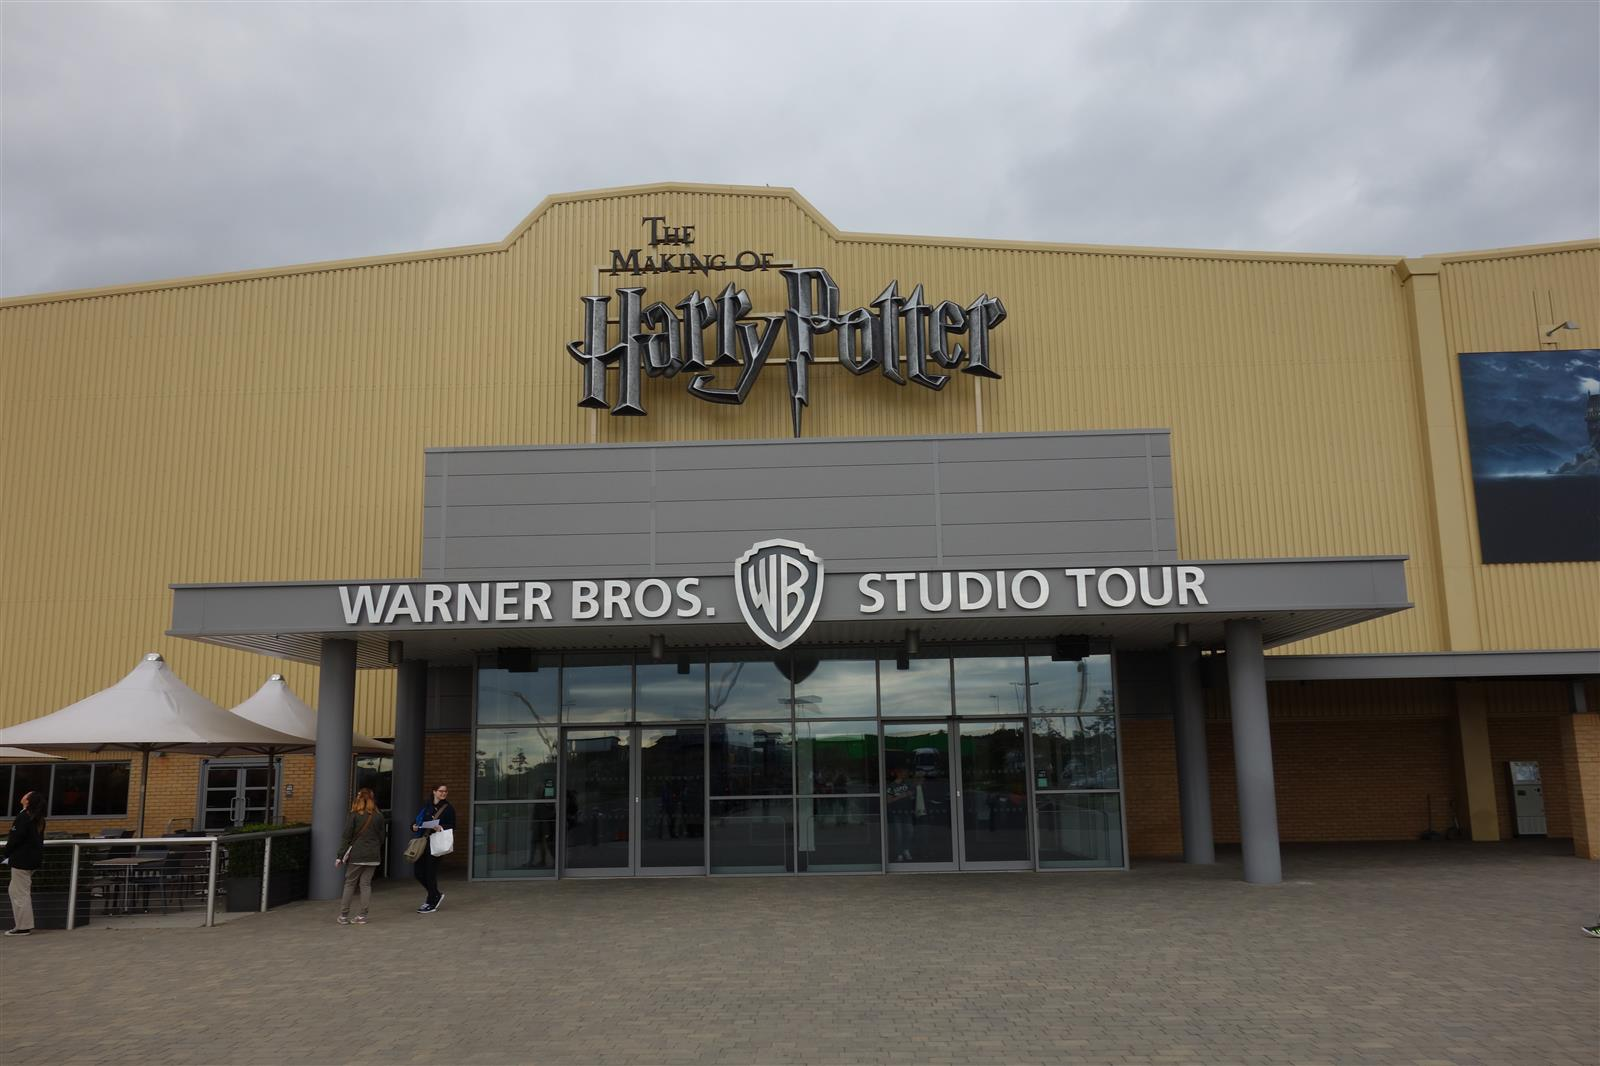 1. WB Studio Tour Entrance